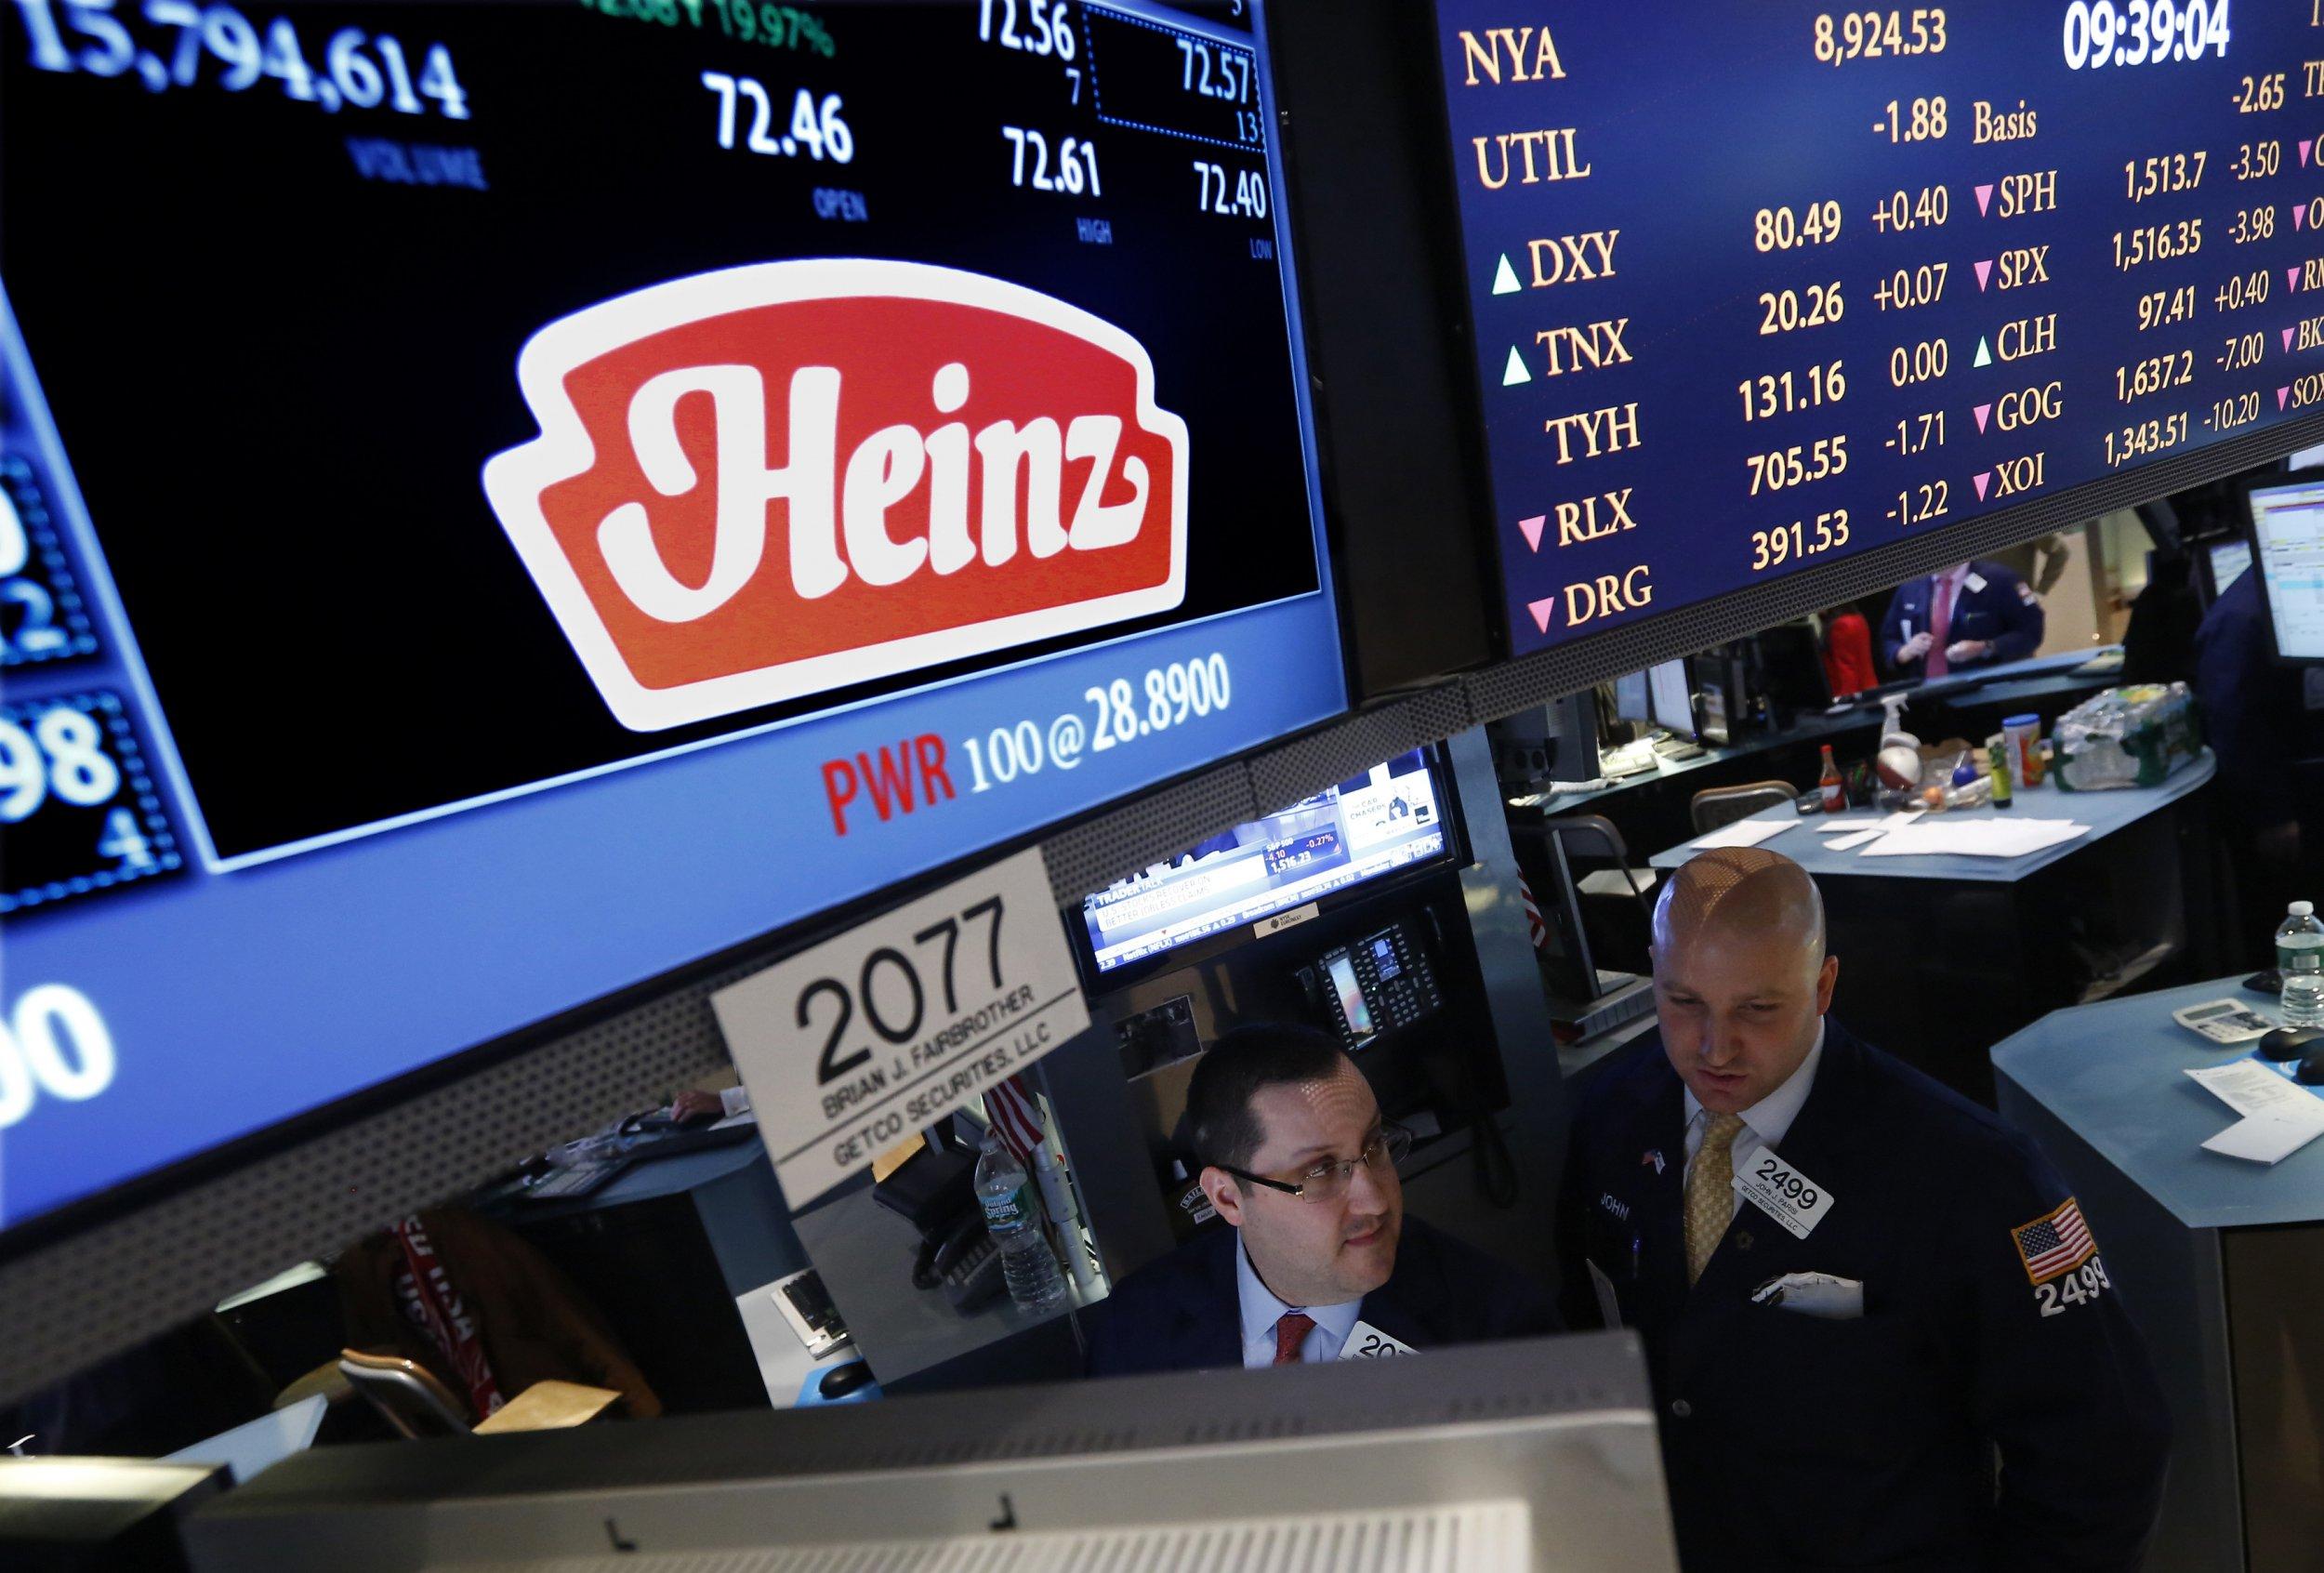 Kraft and Heinz